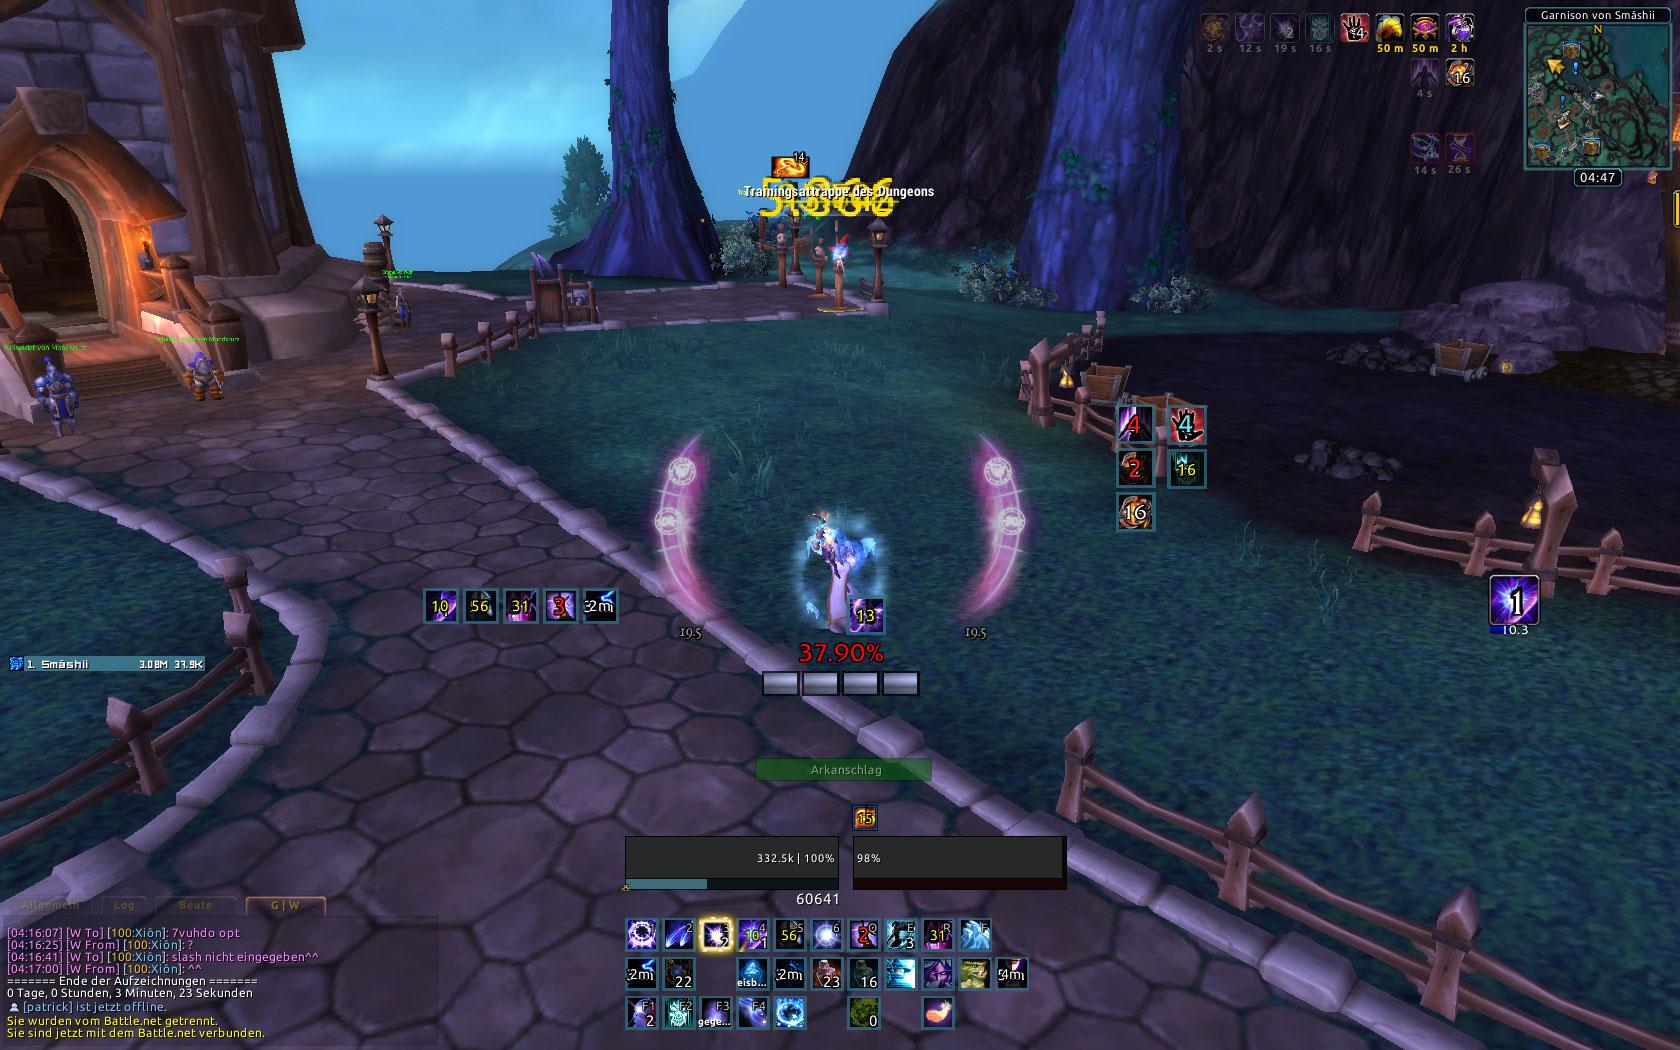 Postet euer Interface #7 - World of Warcraft-Foren